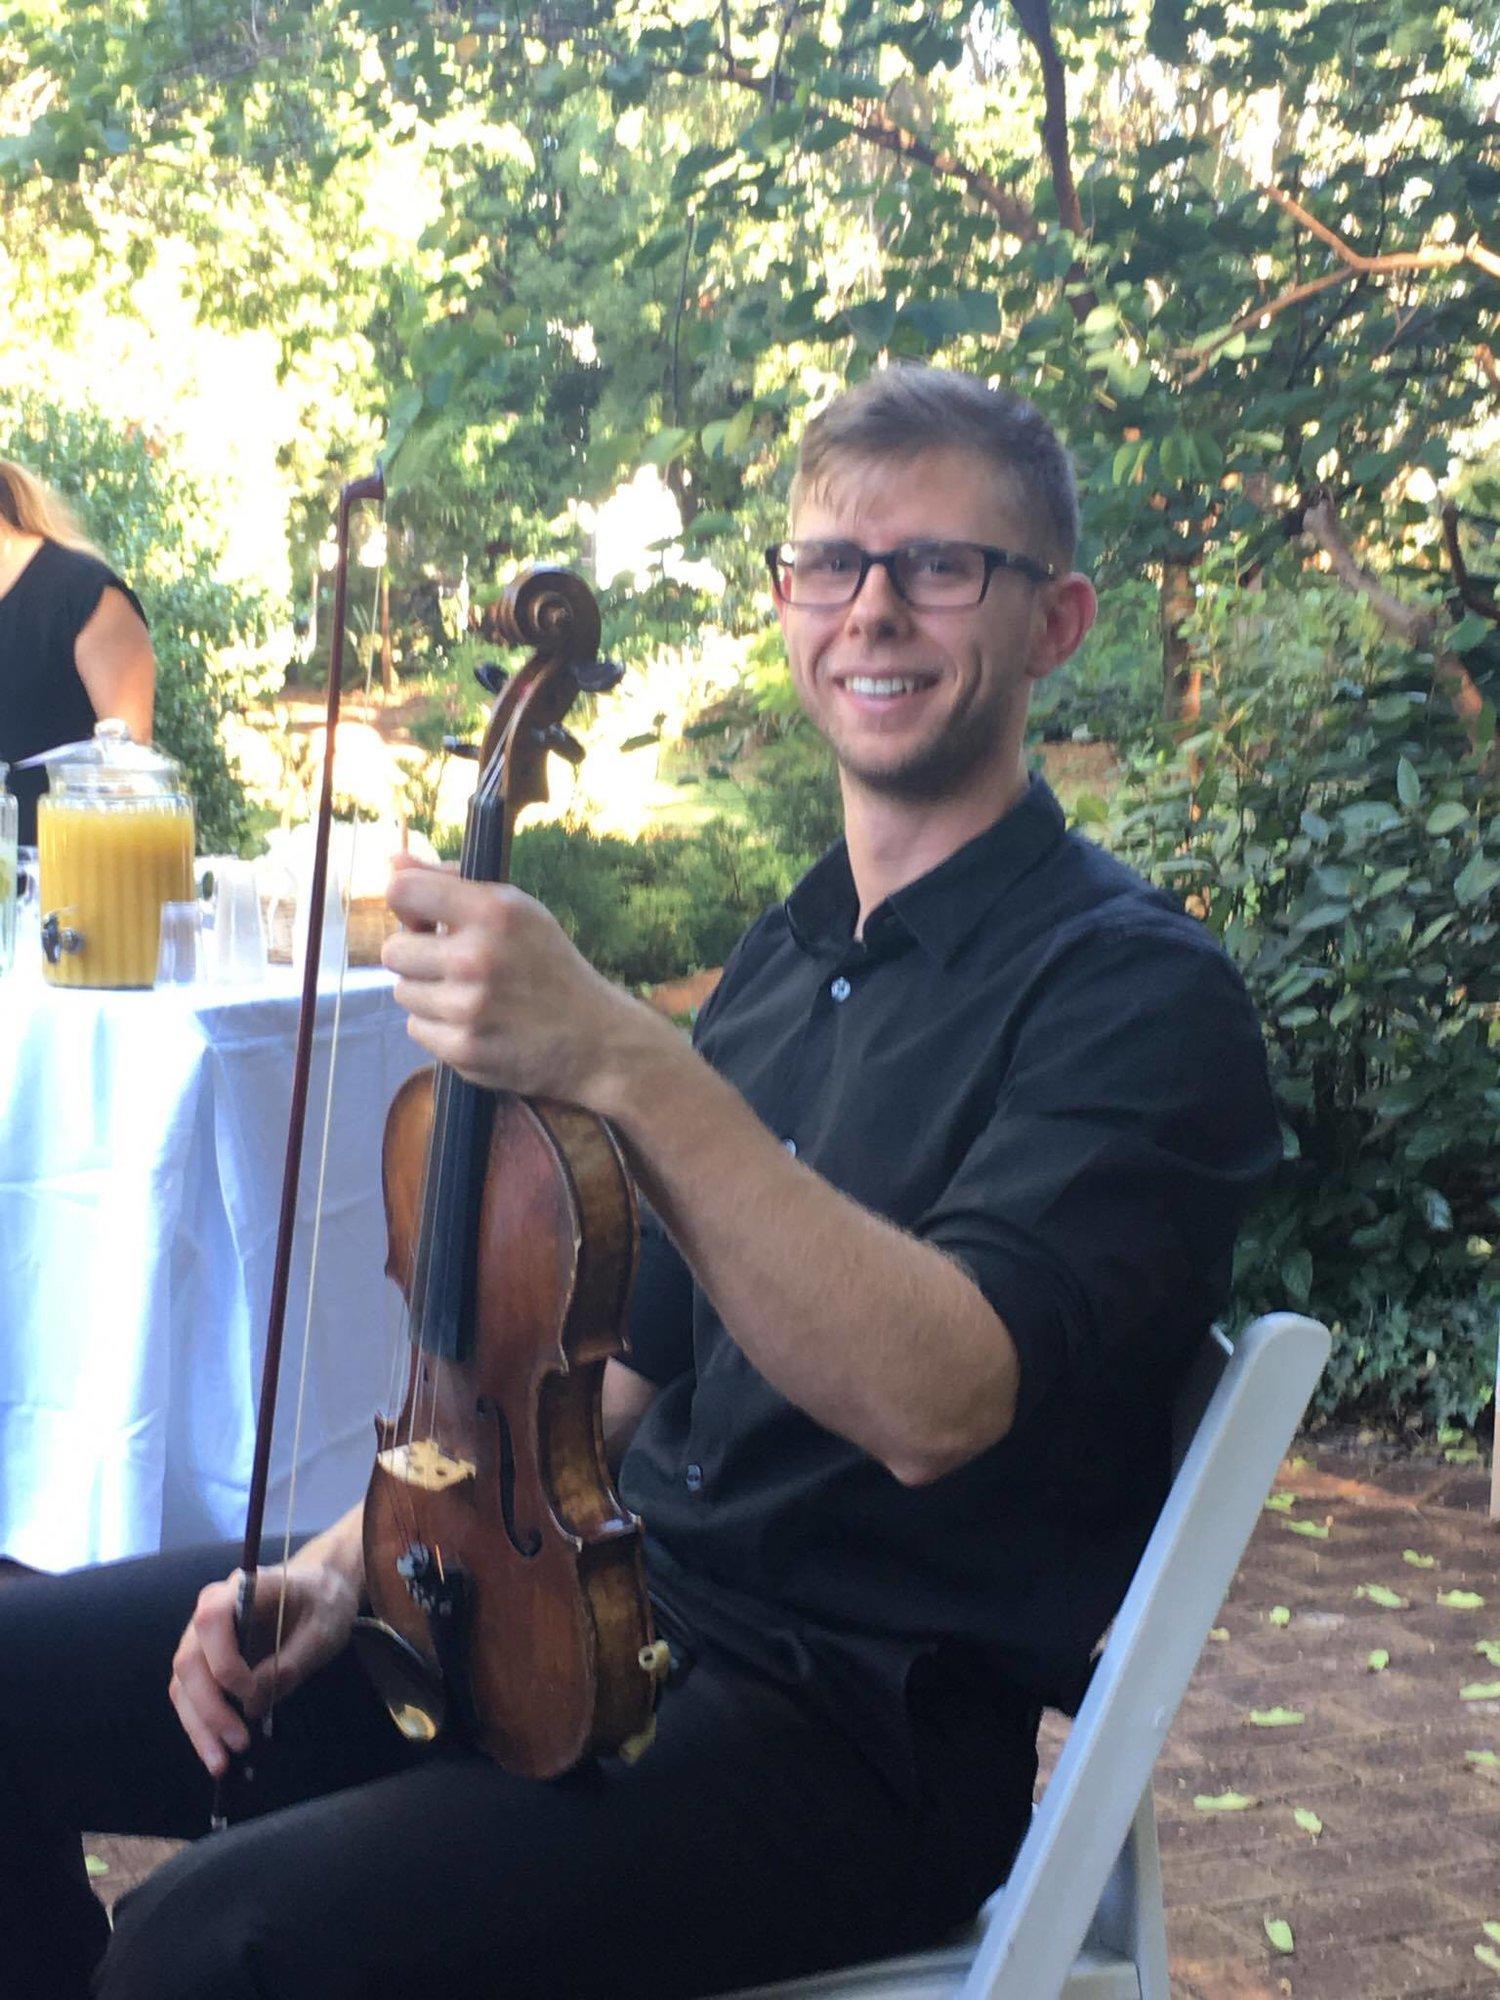 perth-function-string-music-hire-wedding-riverside-musiciansperth-function-string-music-hire-wedding-riverside-musicians-classical-contemporary-violinist-violin